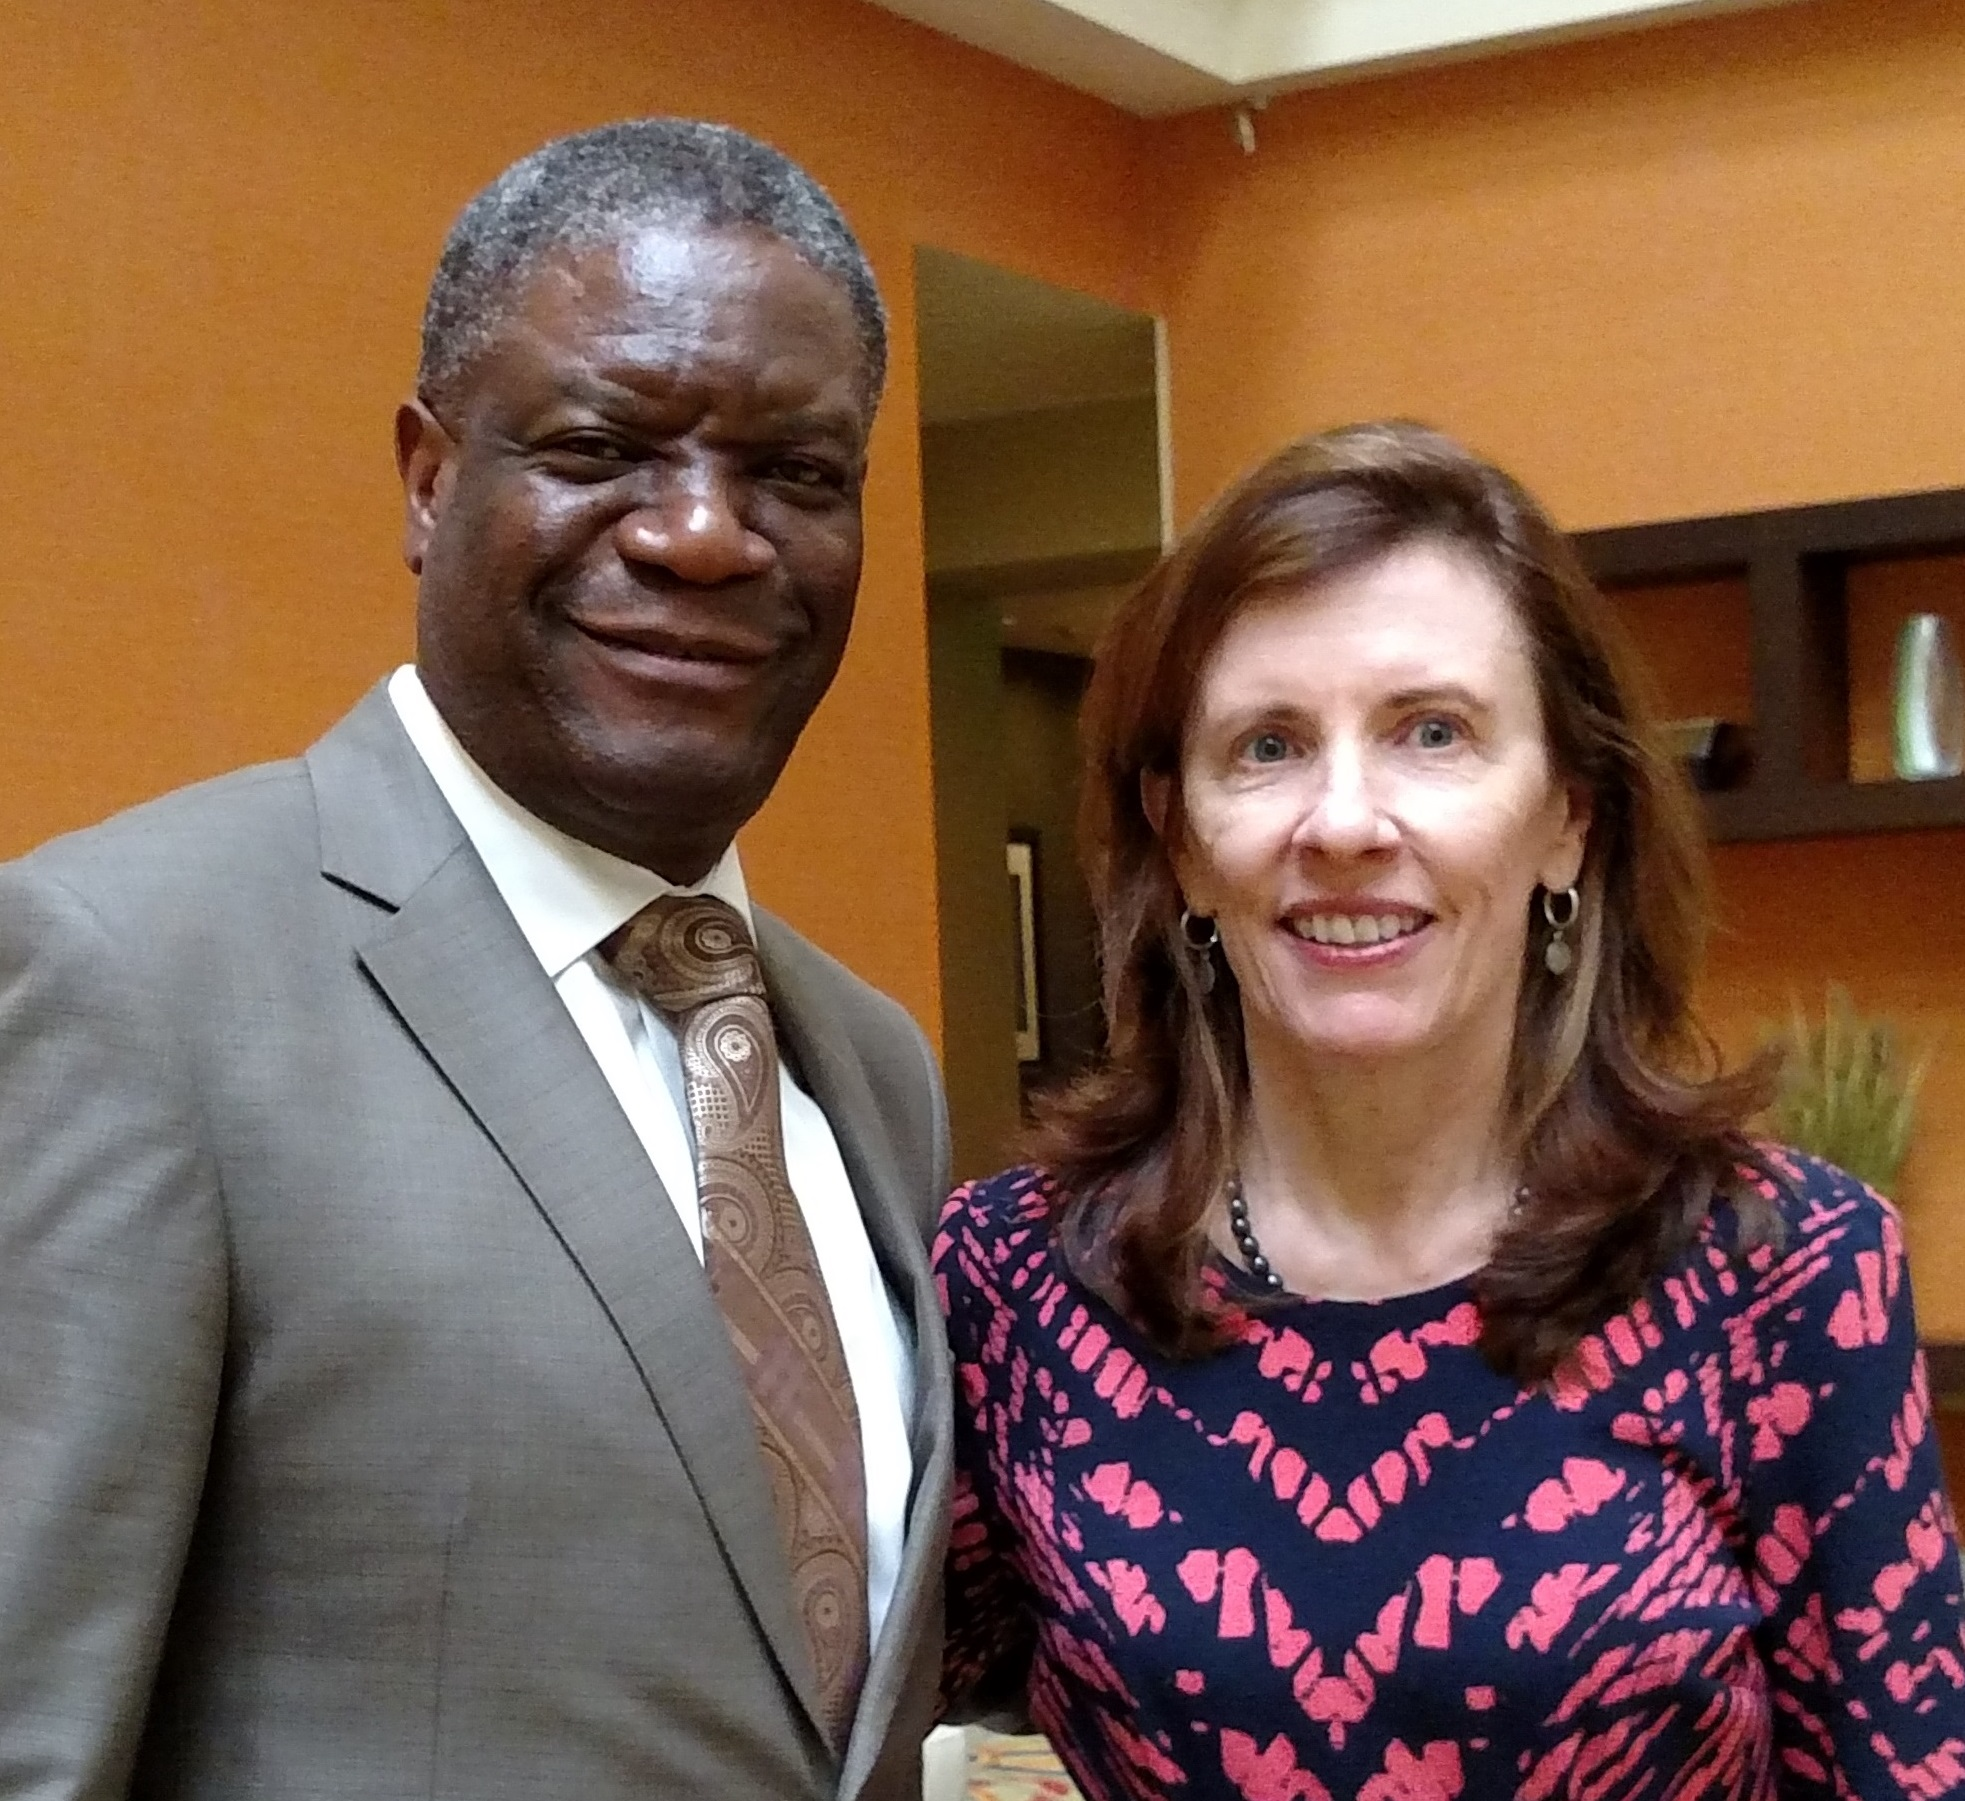 Dr. Denis Mukwege and Fistula Foundation CEO Kate Grant